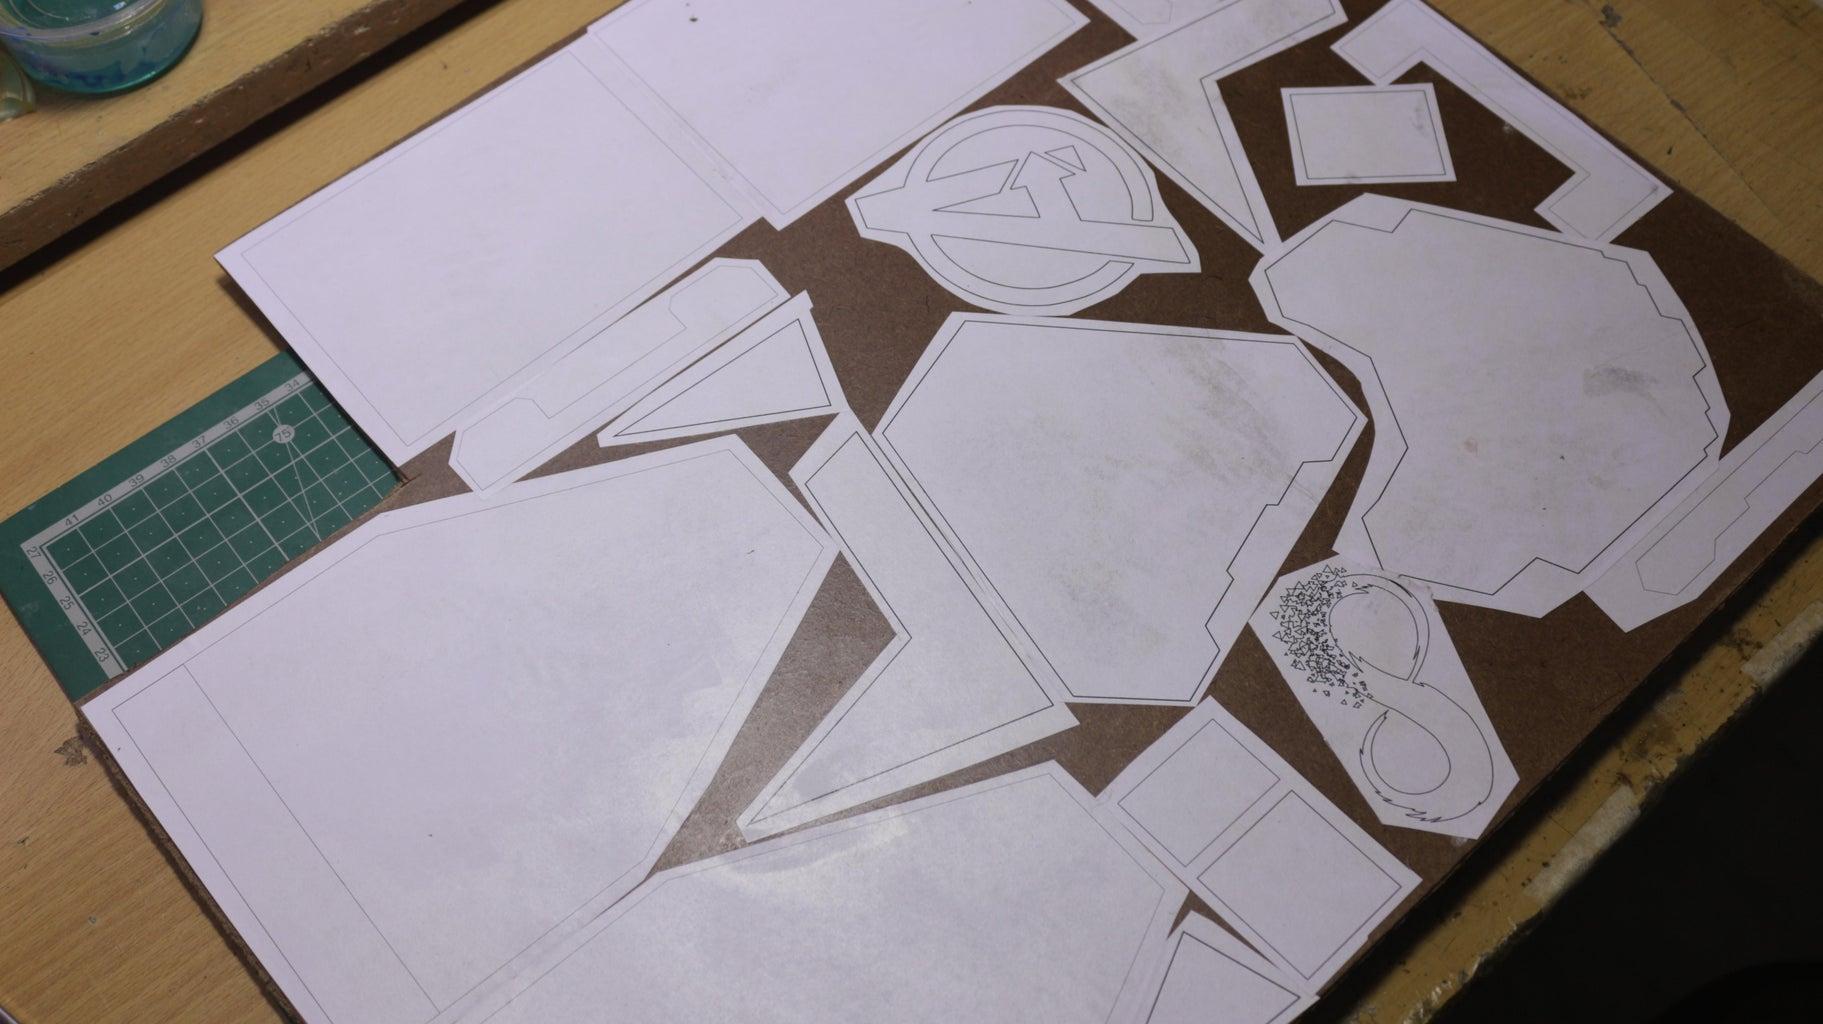 Transferring the Templates on Cardboard